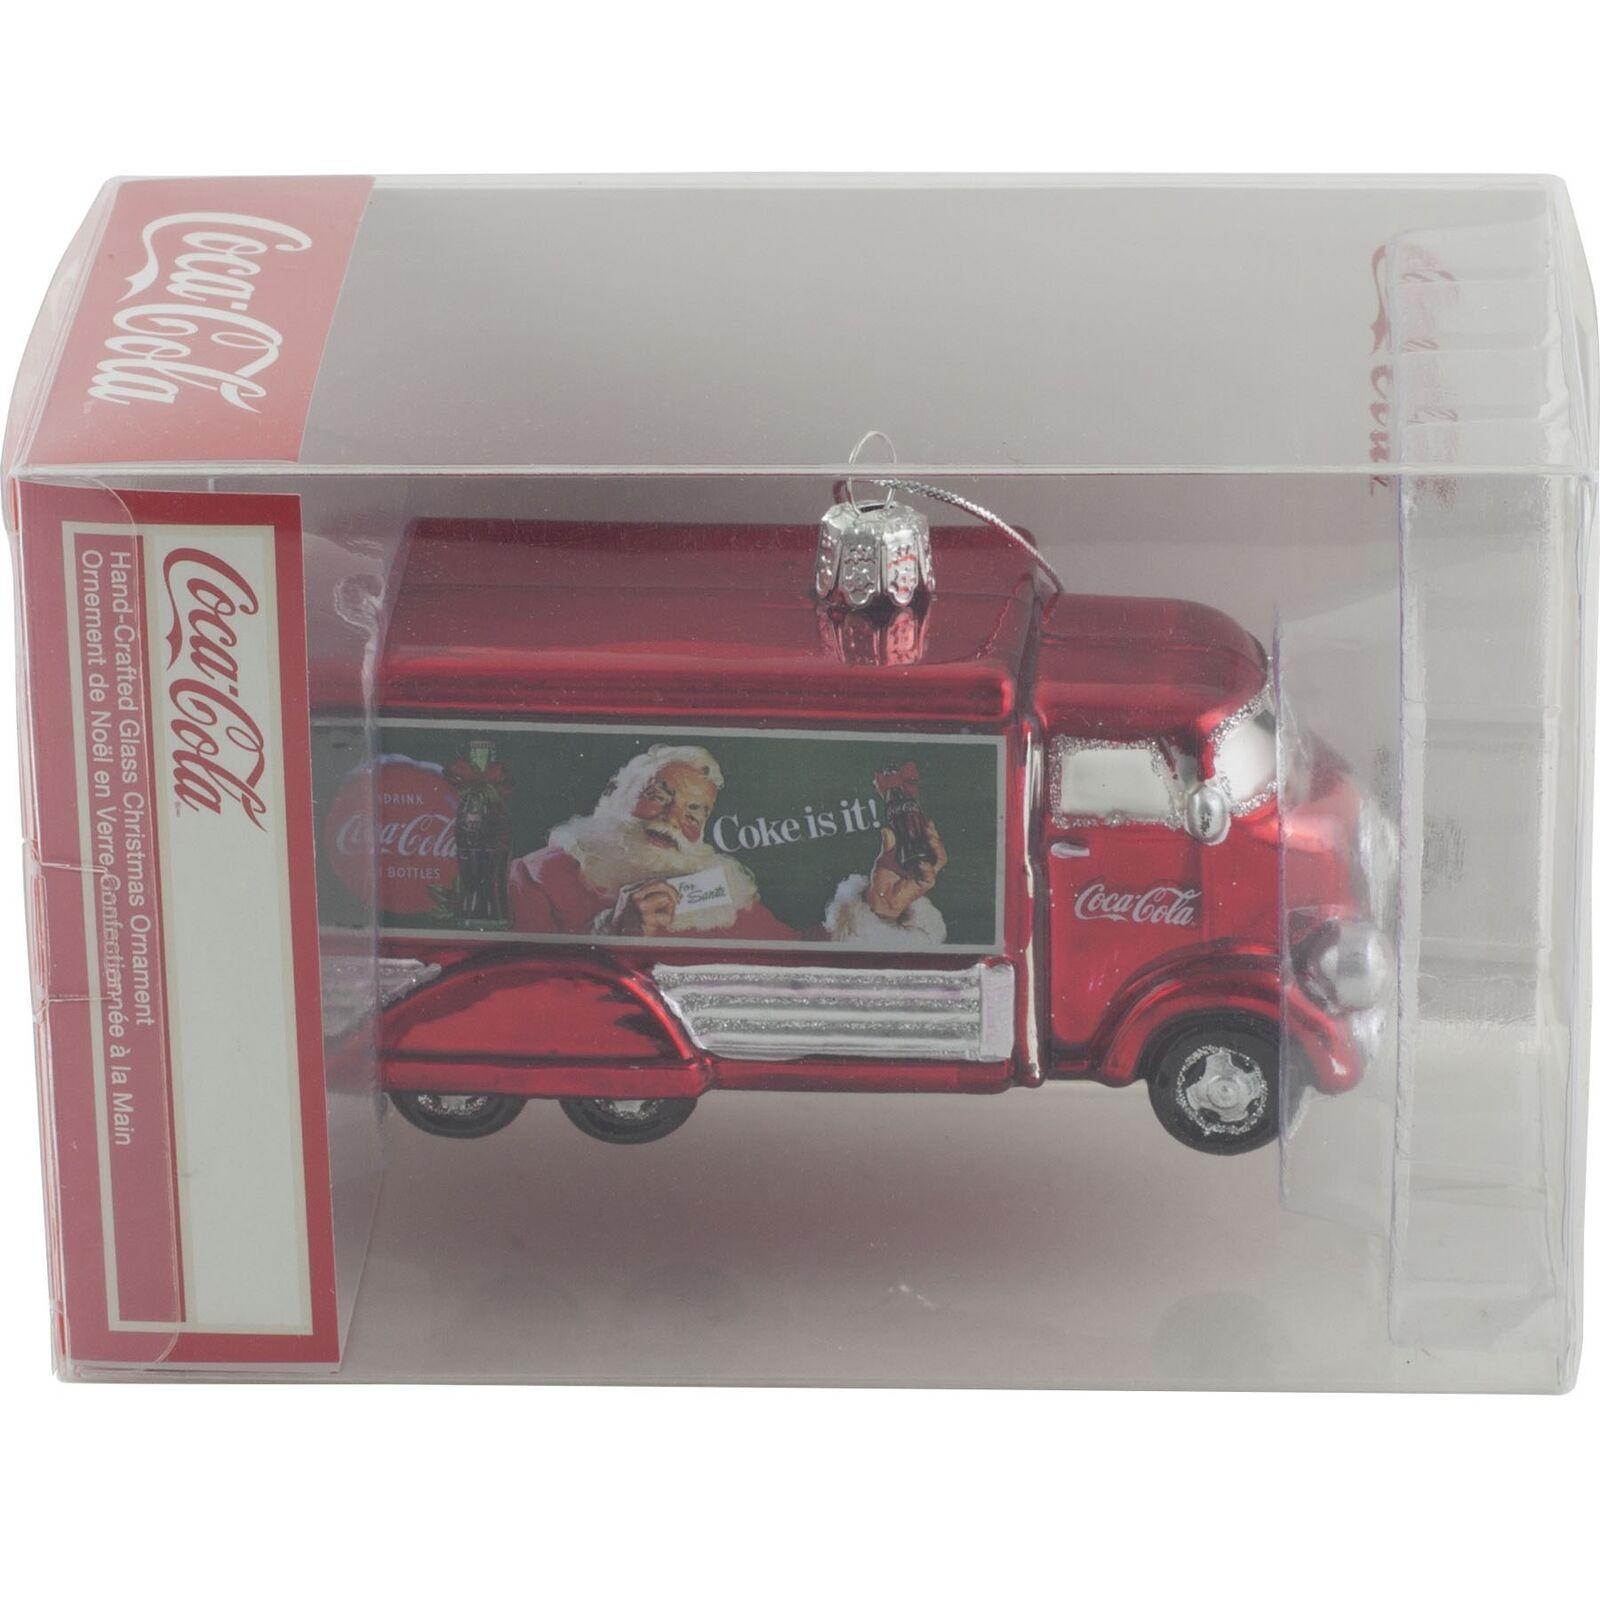 Details About Kurt Adler Coca Cola Truck Glass Christmas Tree Ornament Santa Claus